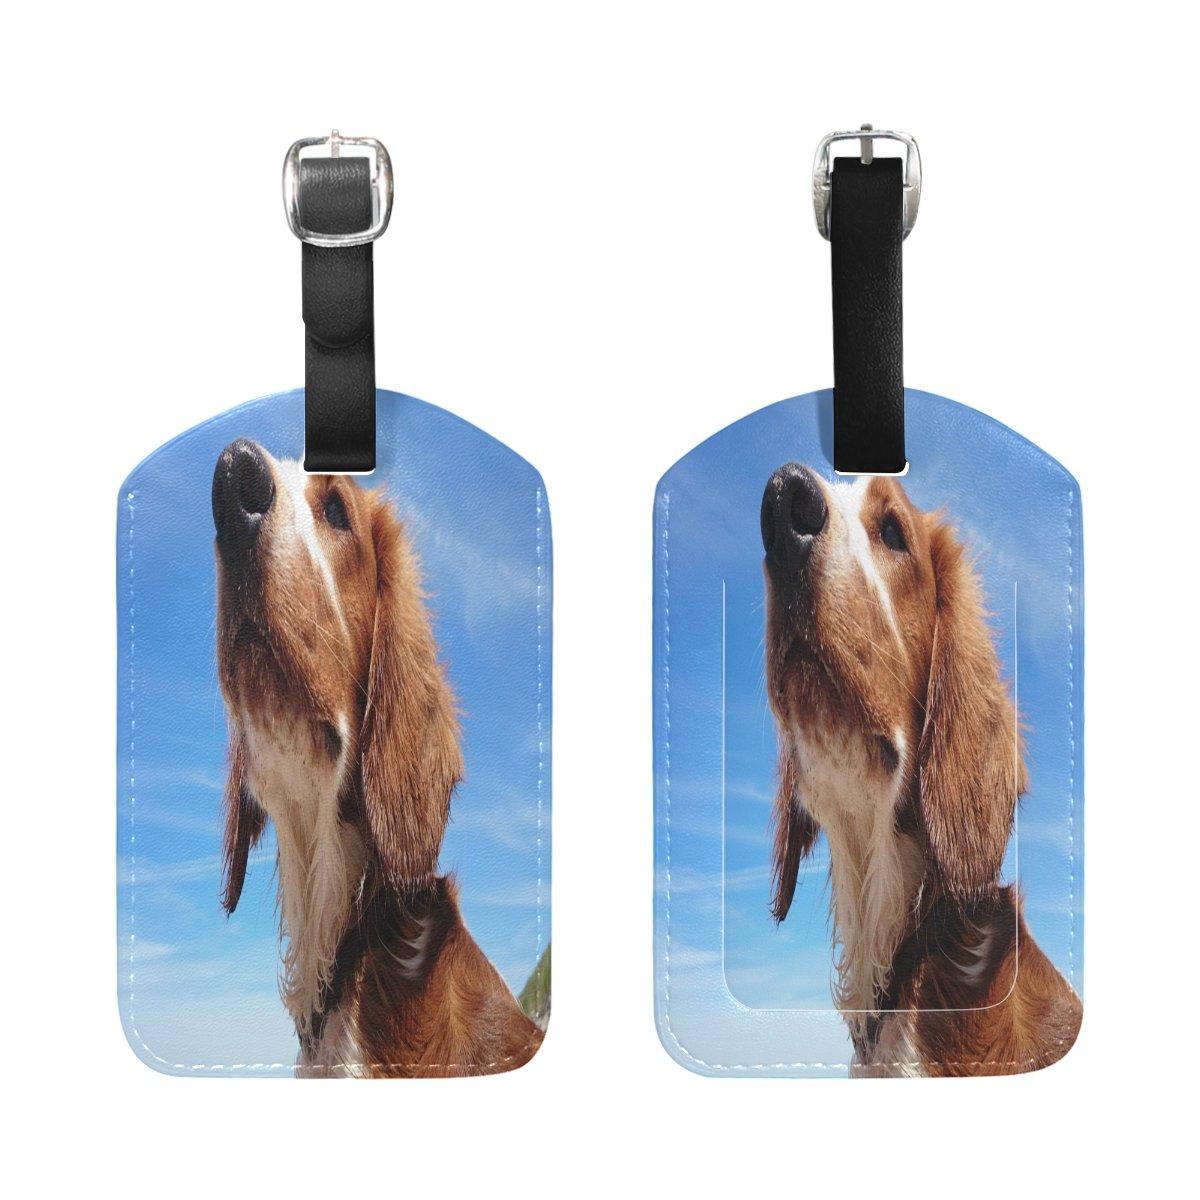 Saobao Travel Luggage Tag Dog And Sky PU Leather Baggage Suitcase Travel ID Bag Tag 1Pcs